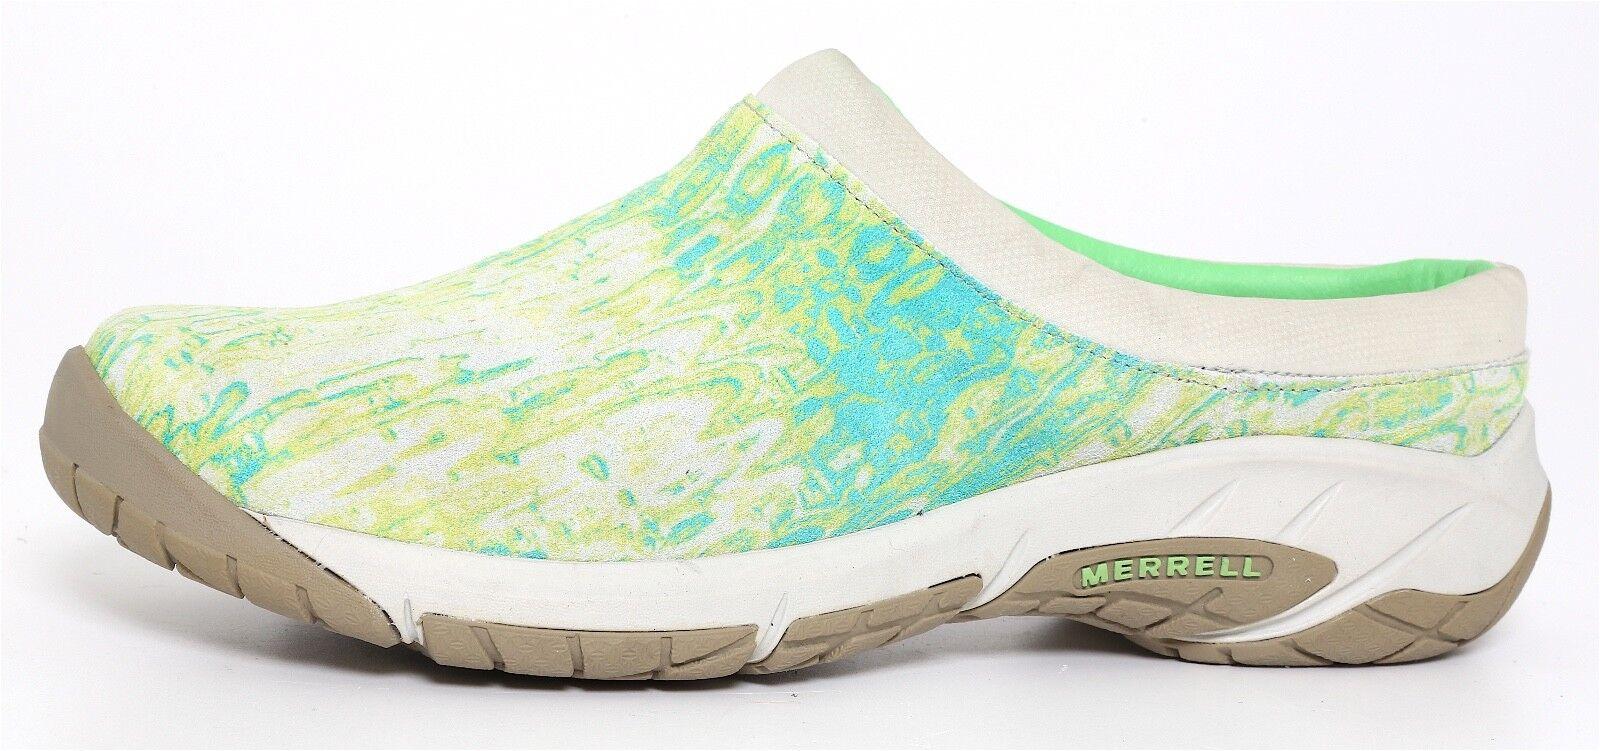 Merrell Green Air Cushion Comfort Performance Shoes Lime Green Merrell Donna Sz 8 1070 5ea63e